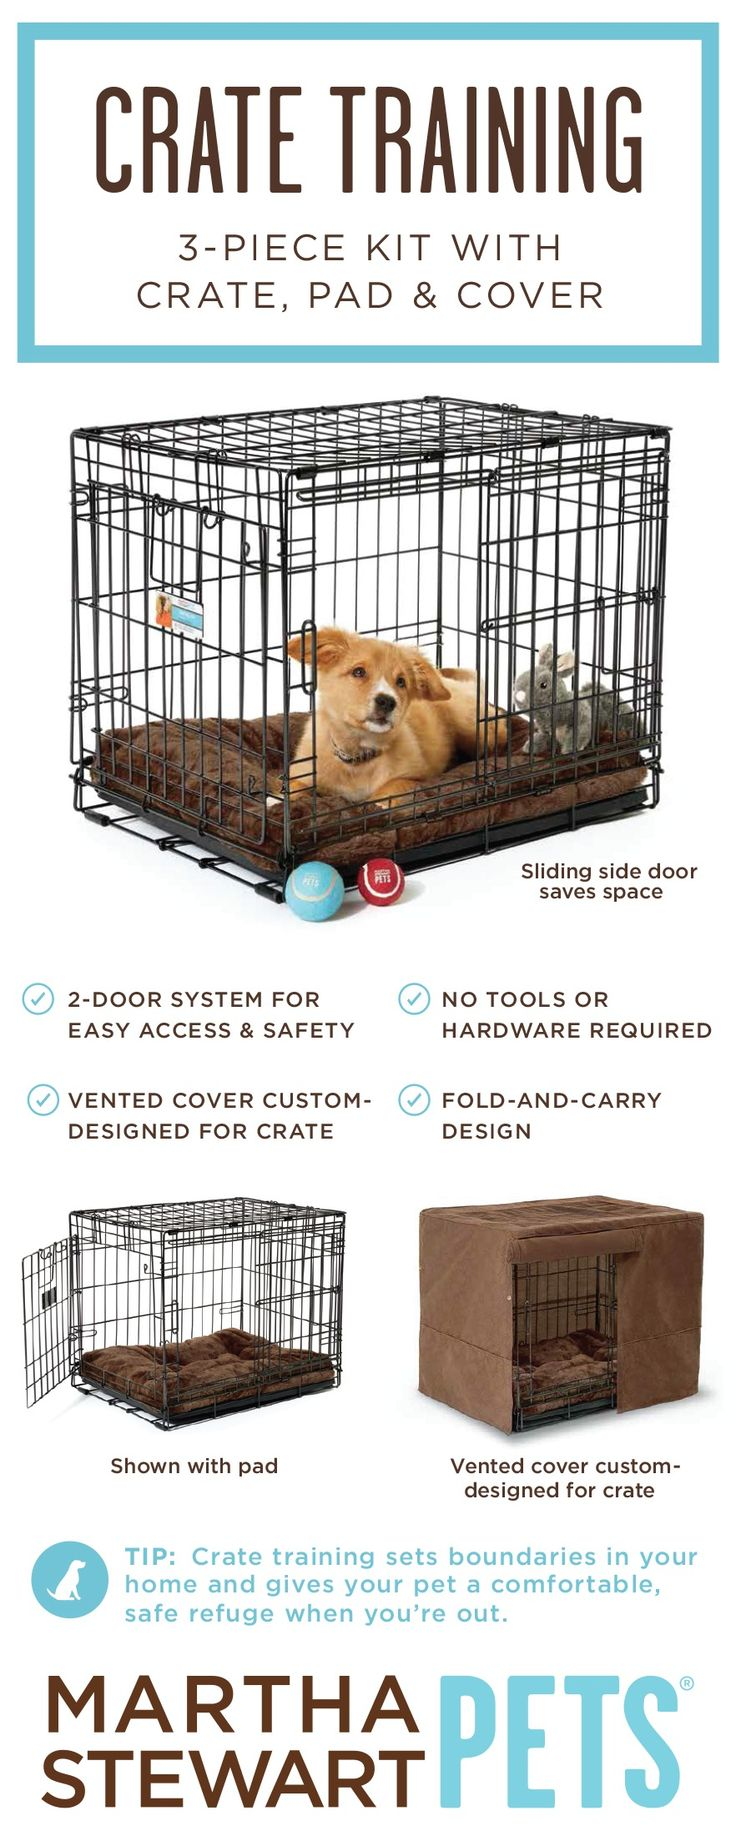 103 best pets images on pinterest dog stuff dog training and